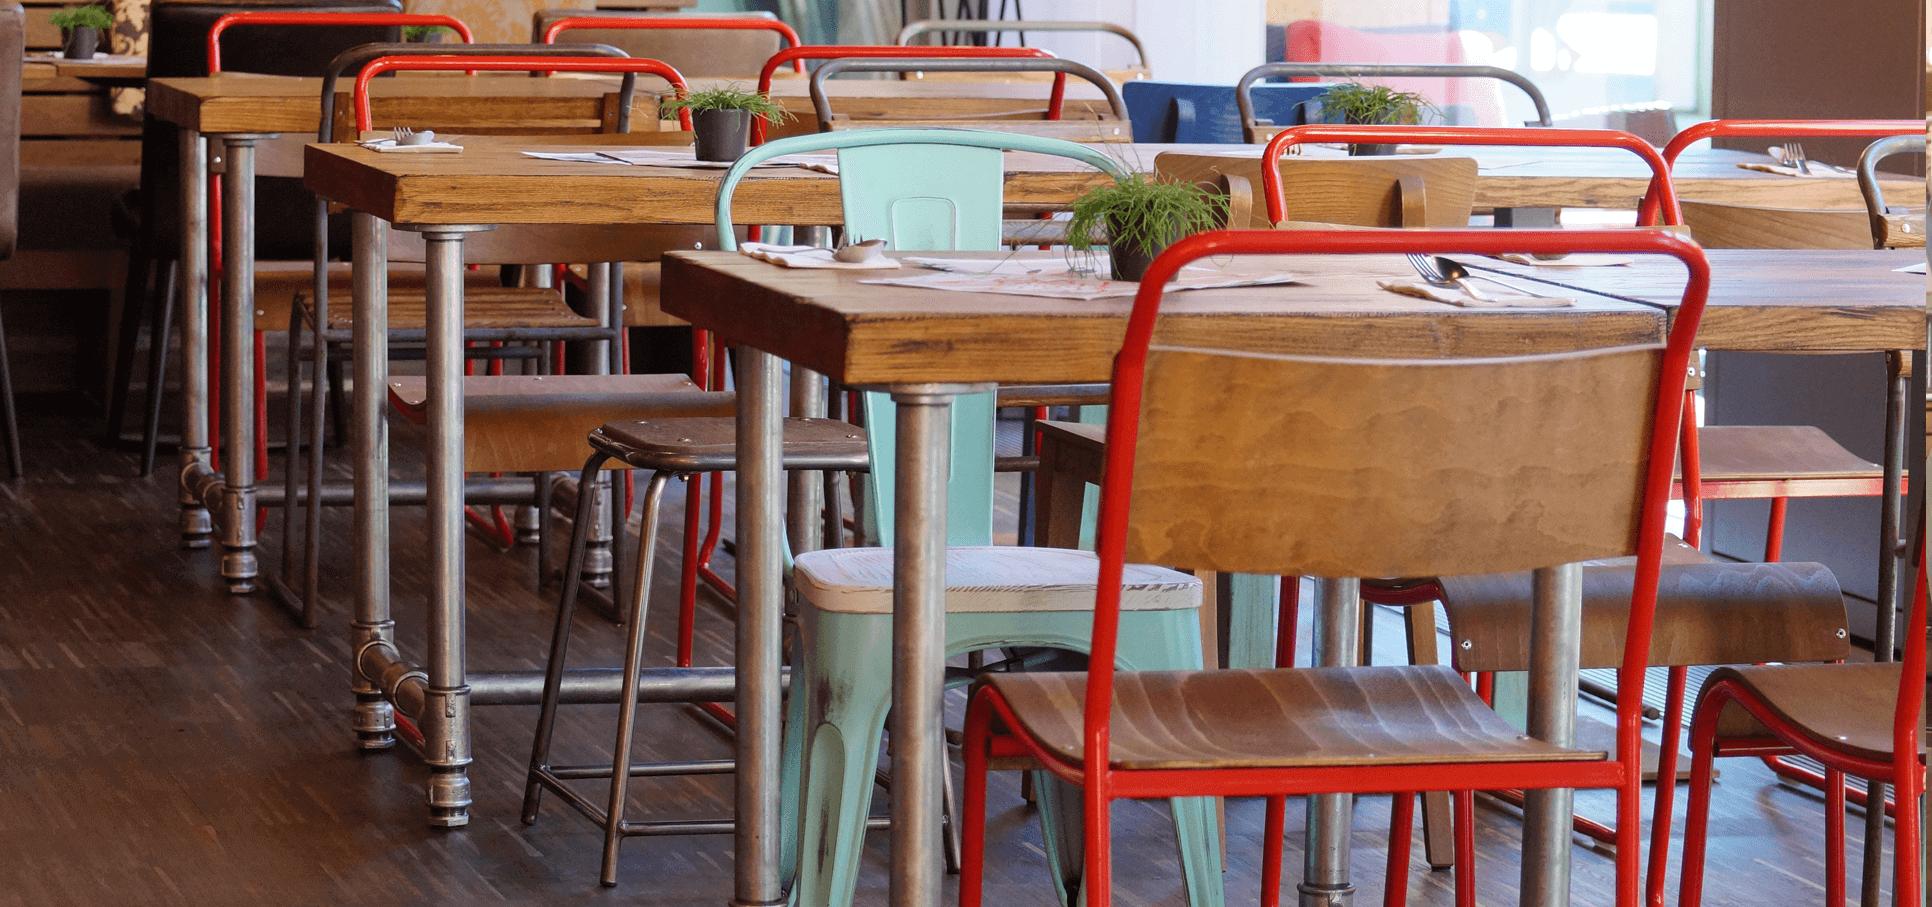 Ladenbau-Restaurant-ChaCha-rohrfabrik-vintage-rohre1.png